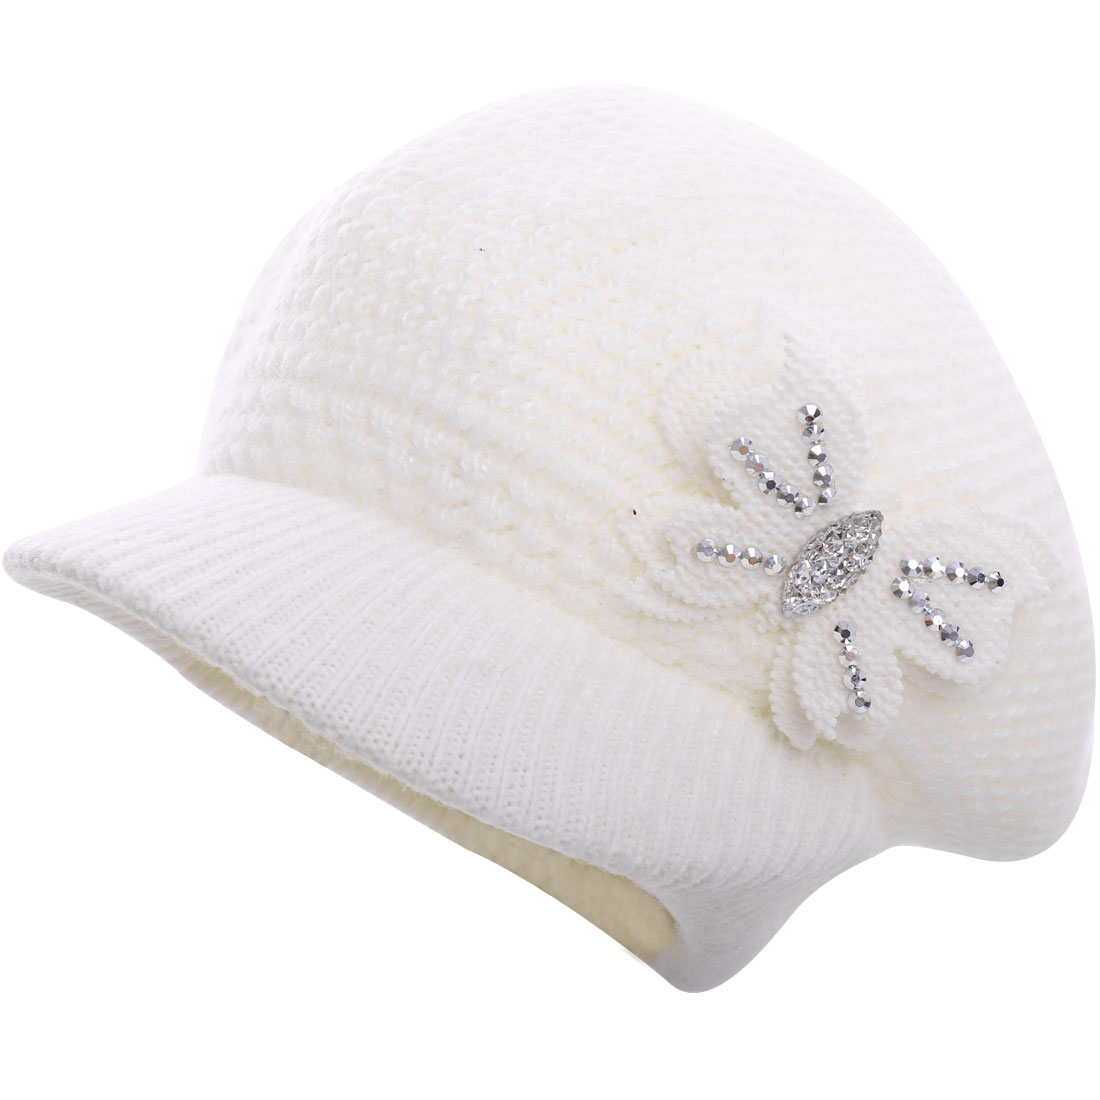 Women Butterfly Design Textured Knitting Beret Brim Hat White